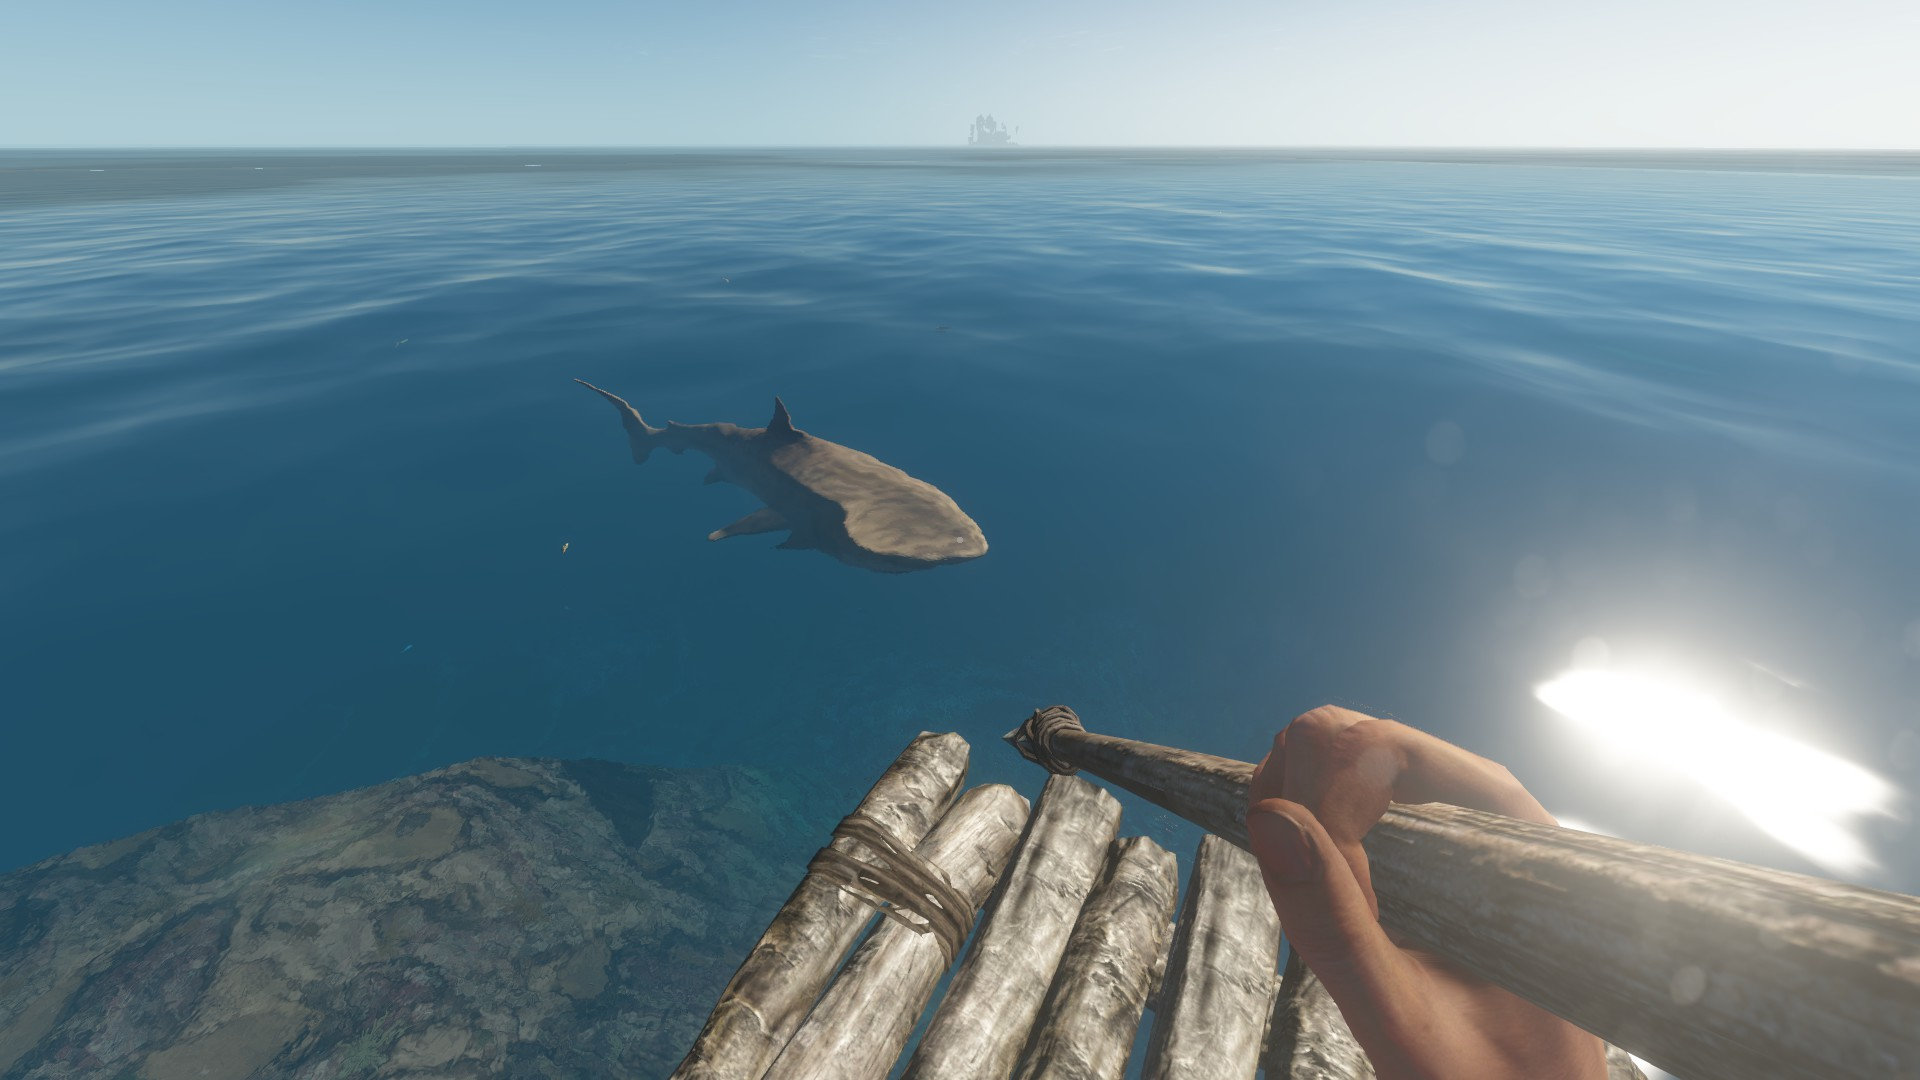 Shark | Stranded Deep Wiki | FANDOM powered by Wikia